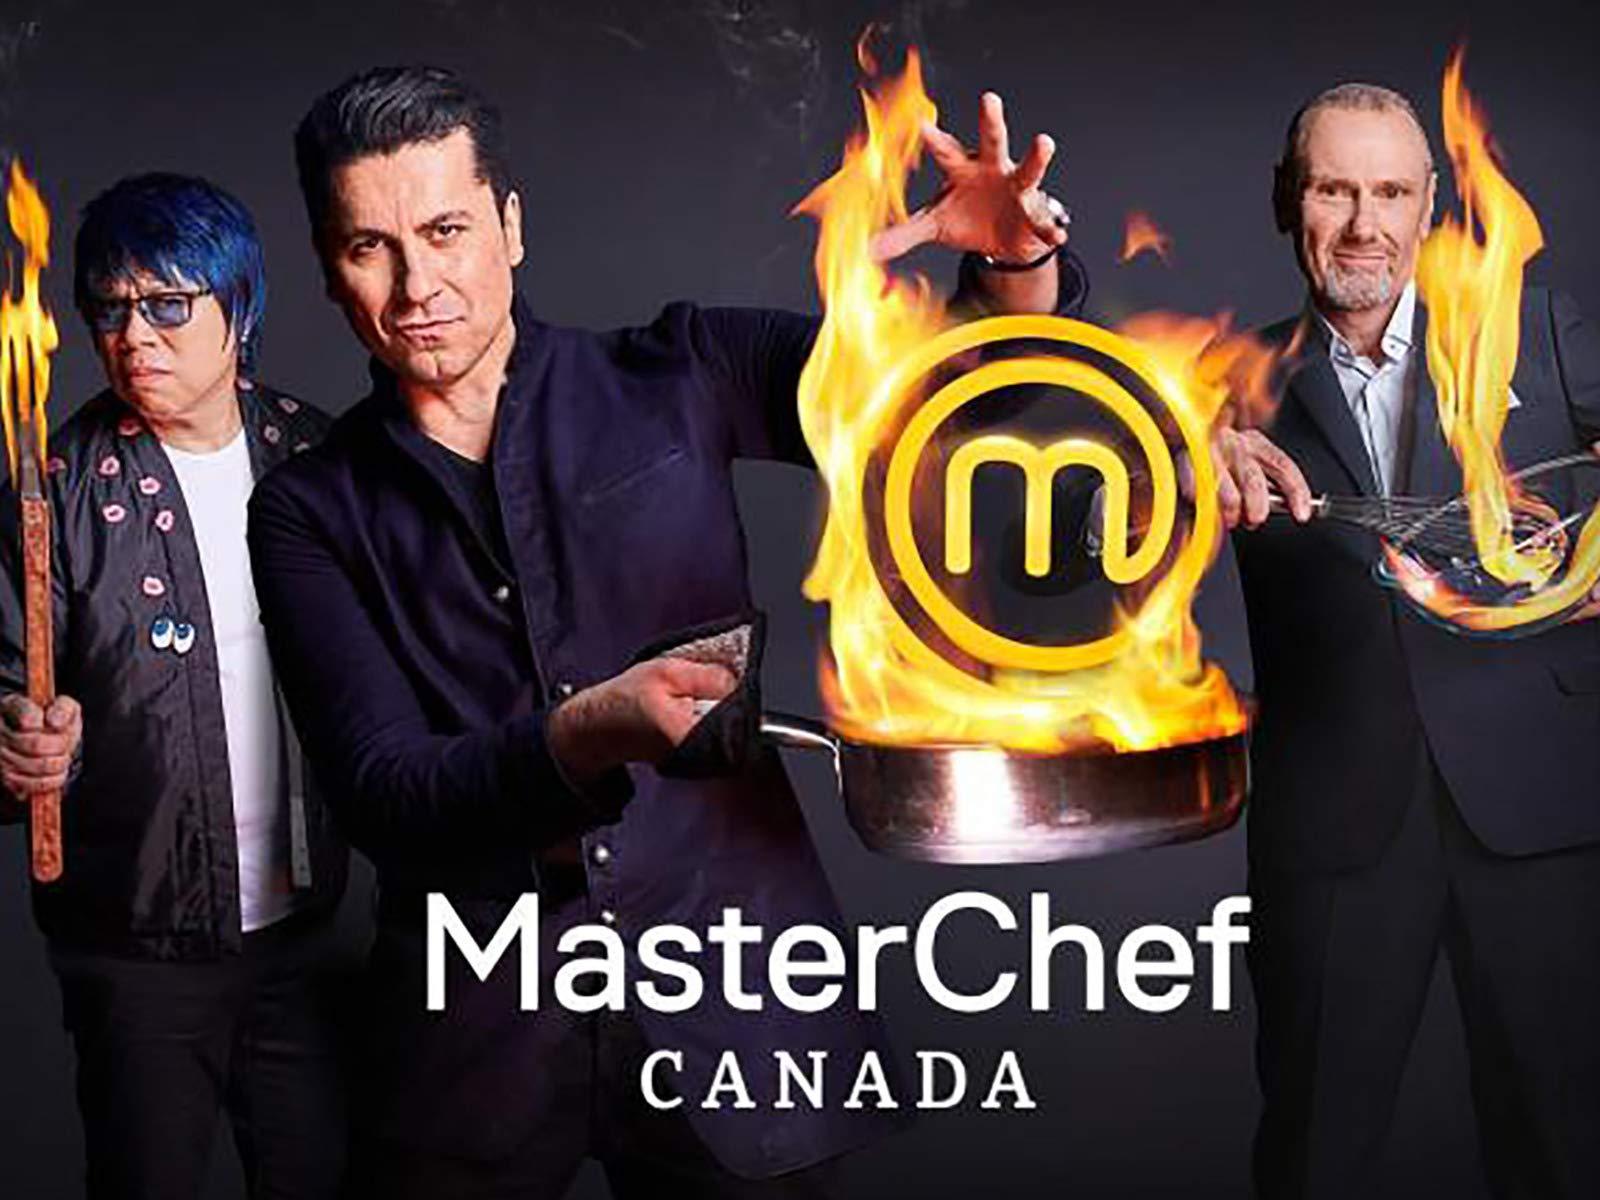 Masterchef Canada on Amazon Prime Video UK